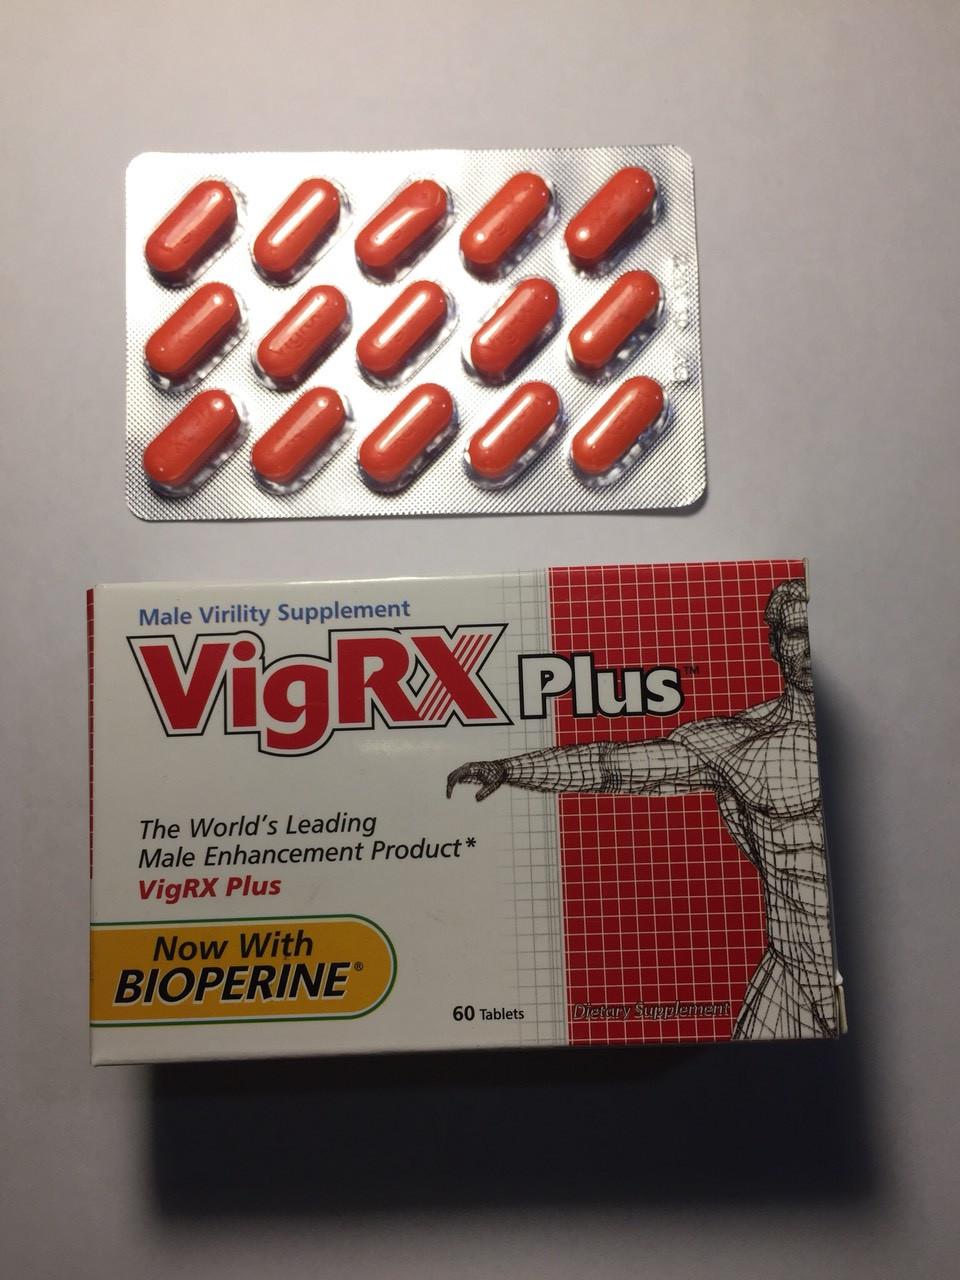 Препарат для увеличения потенции и члена VigRX Вигрикс Plus 100% ОРИГИНАЛ!!!  Сертификат!  (таблетки 60 штук)